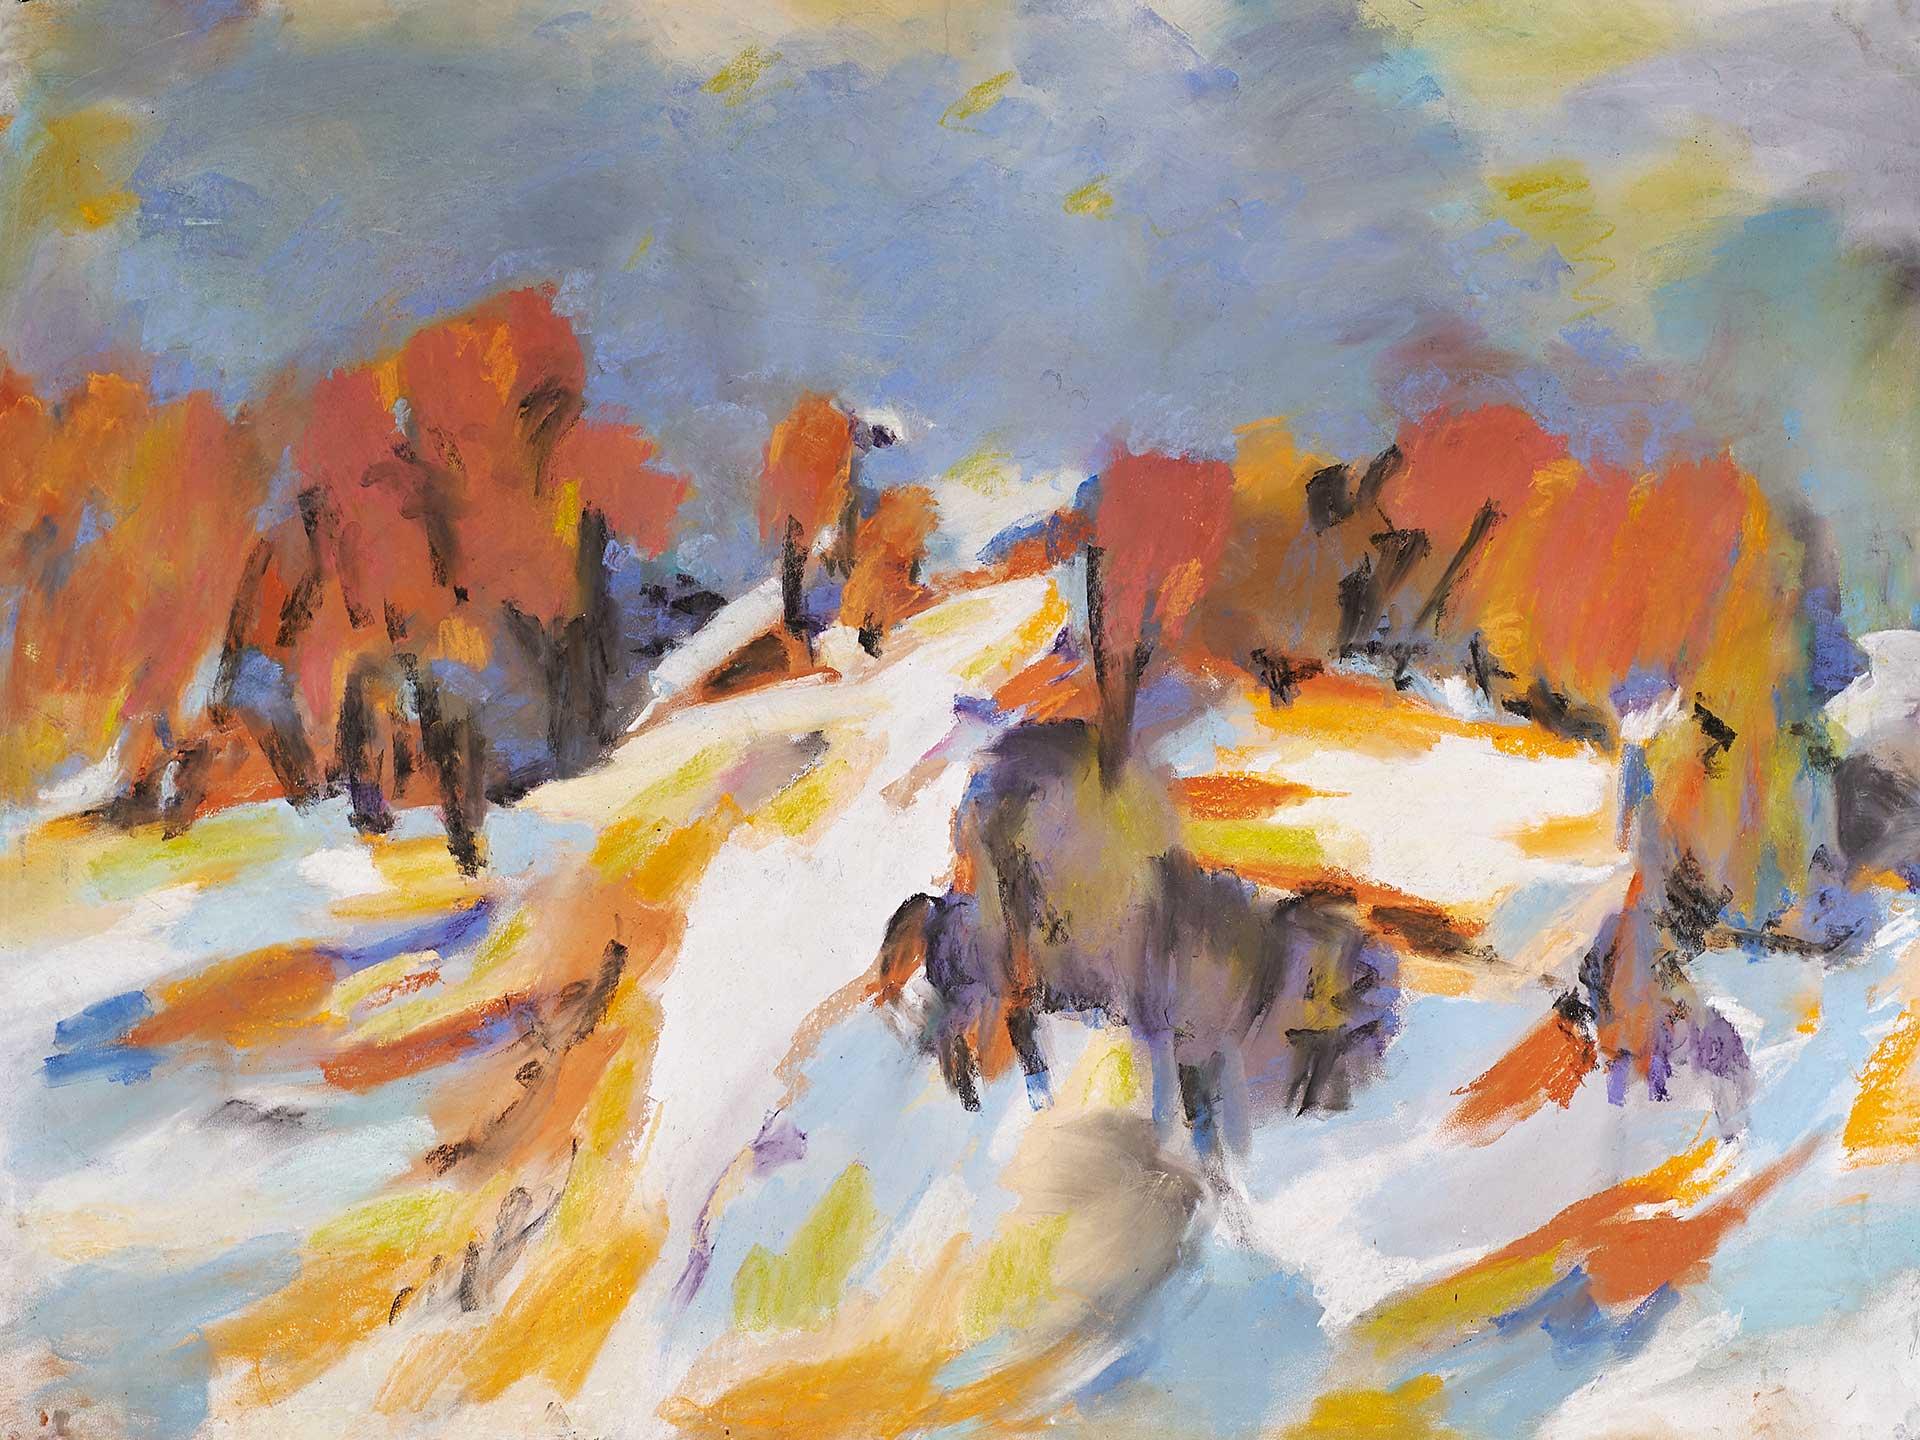 Baeume-in-Farben-VI--125x95cm